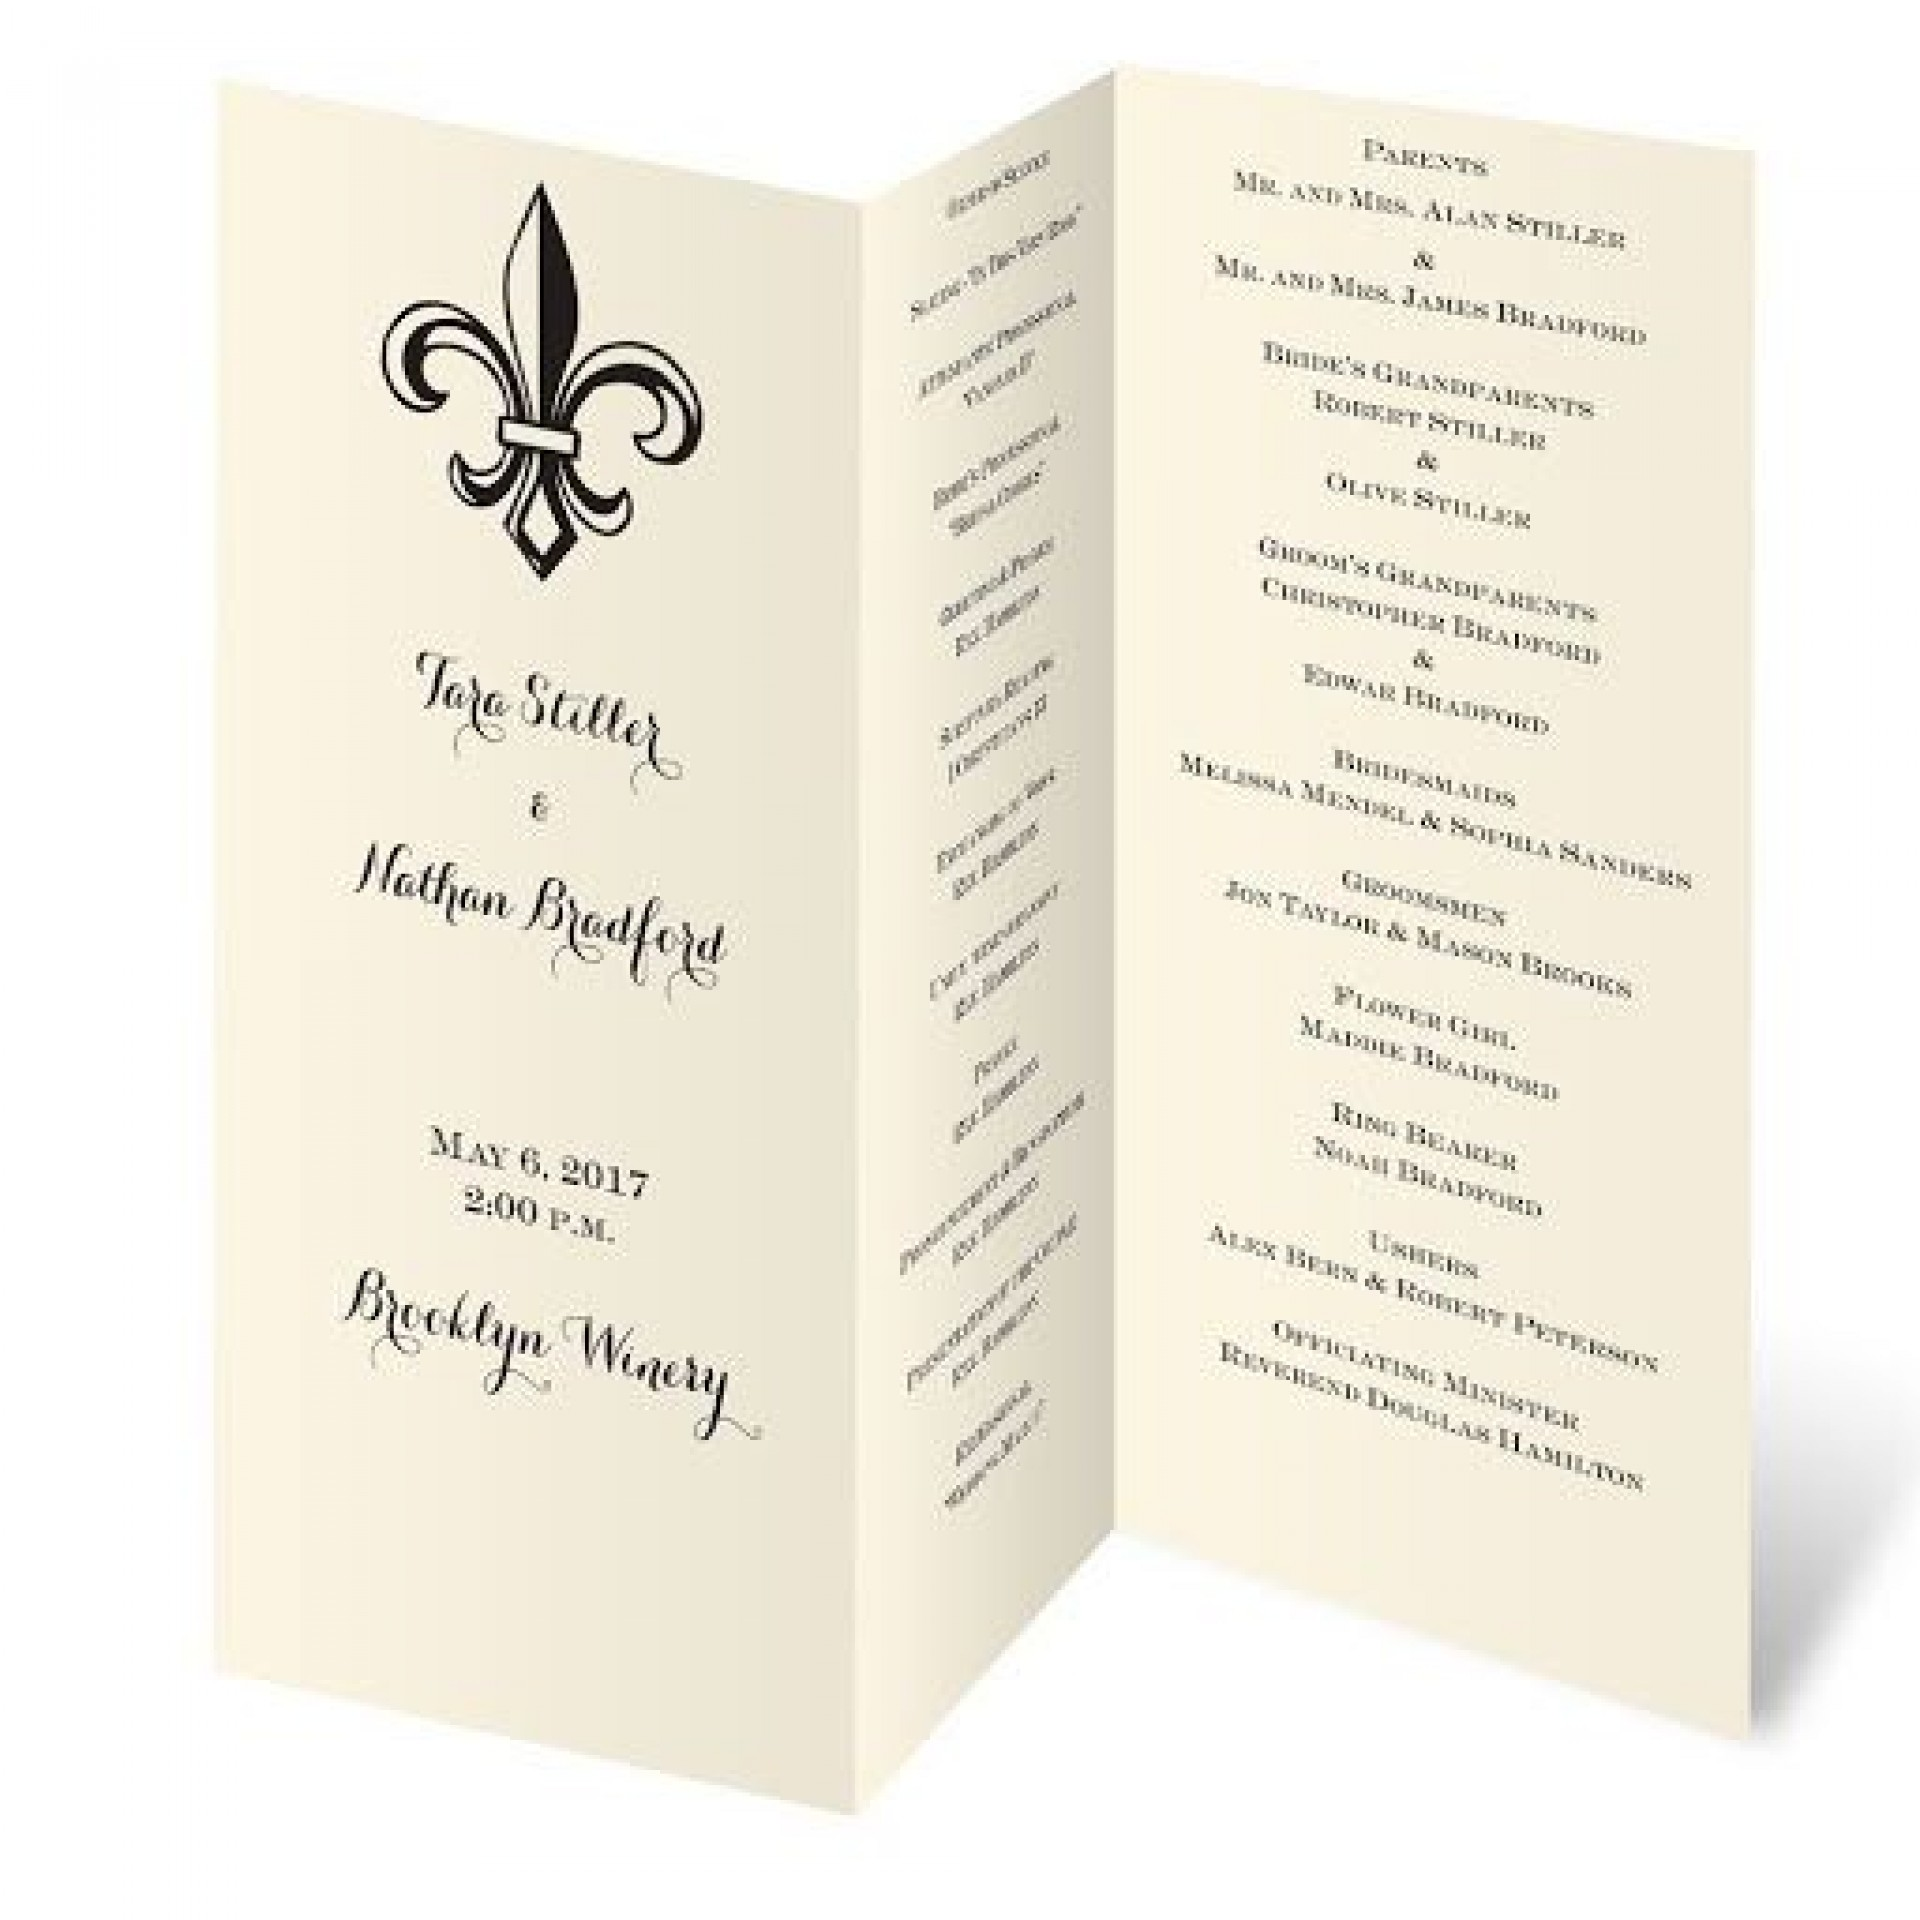 009 Imposing Trifold Wedding Program Template Design  Templates Tri Fold Tri-fold Publisher Free Foldable1920